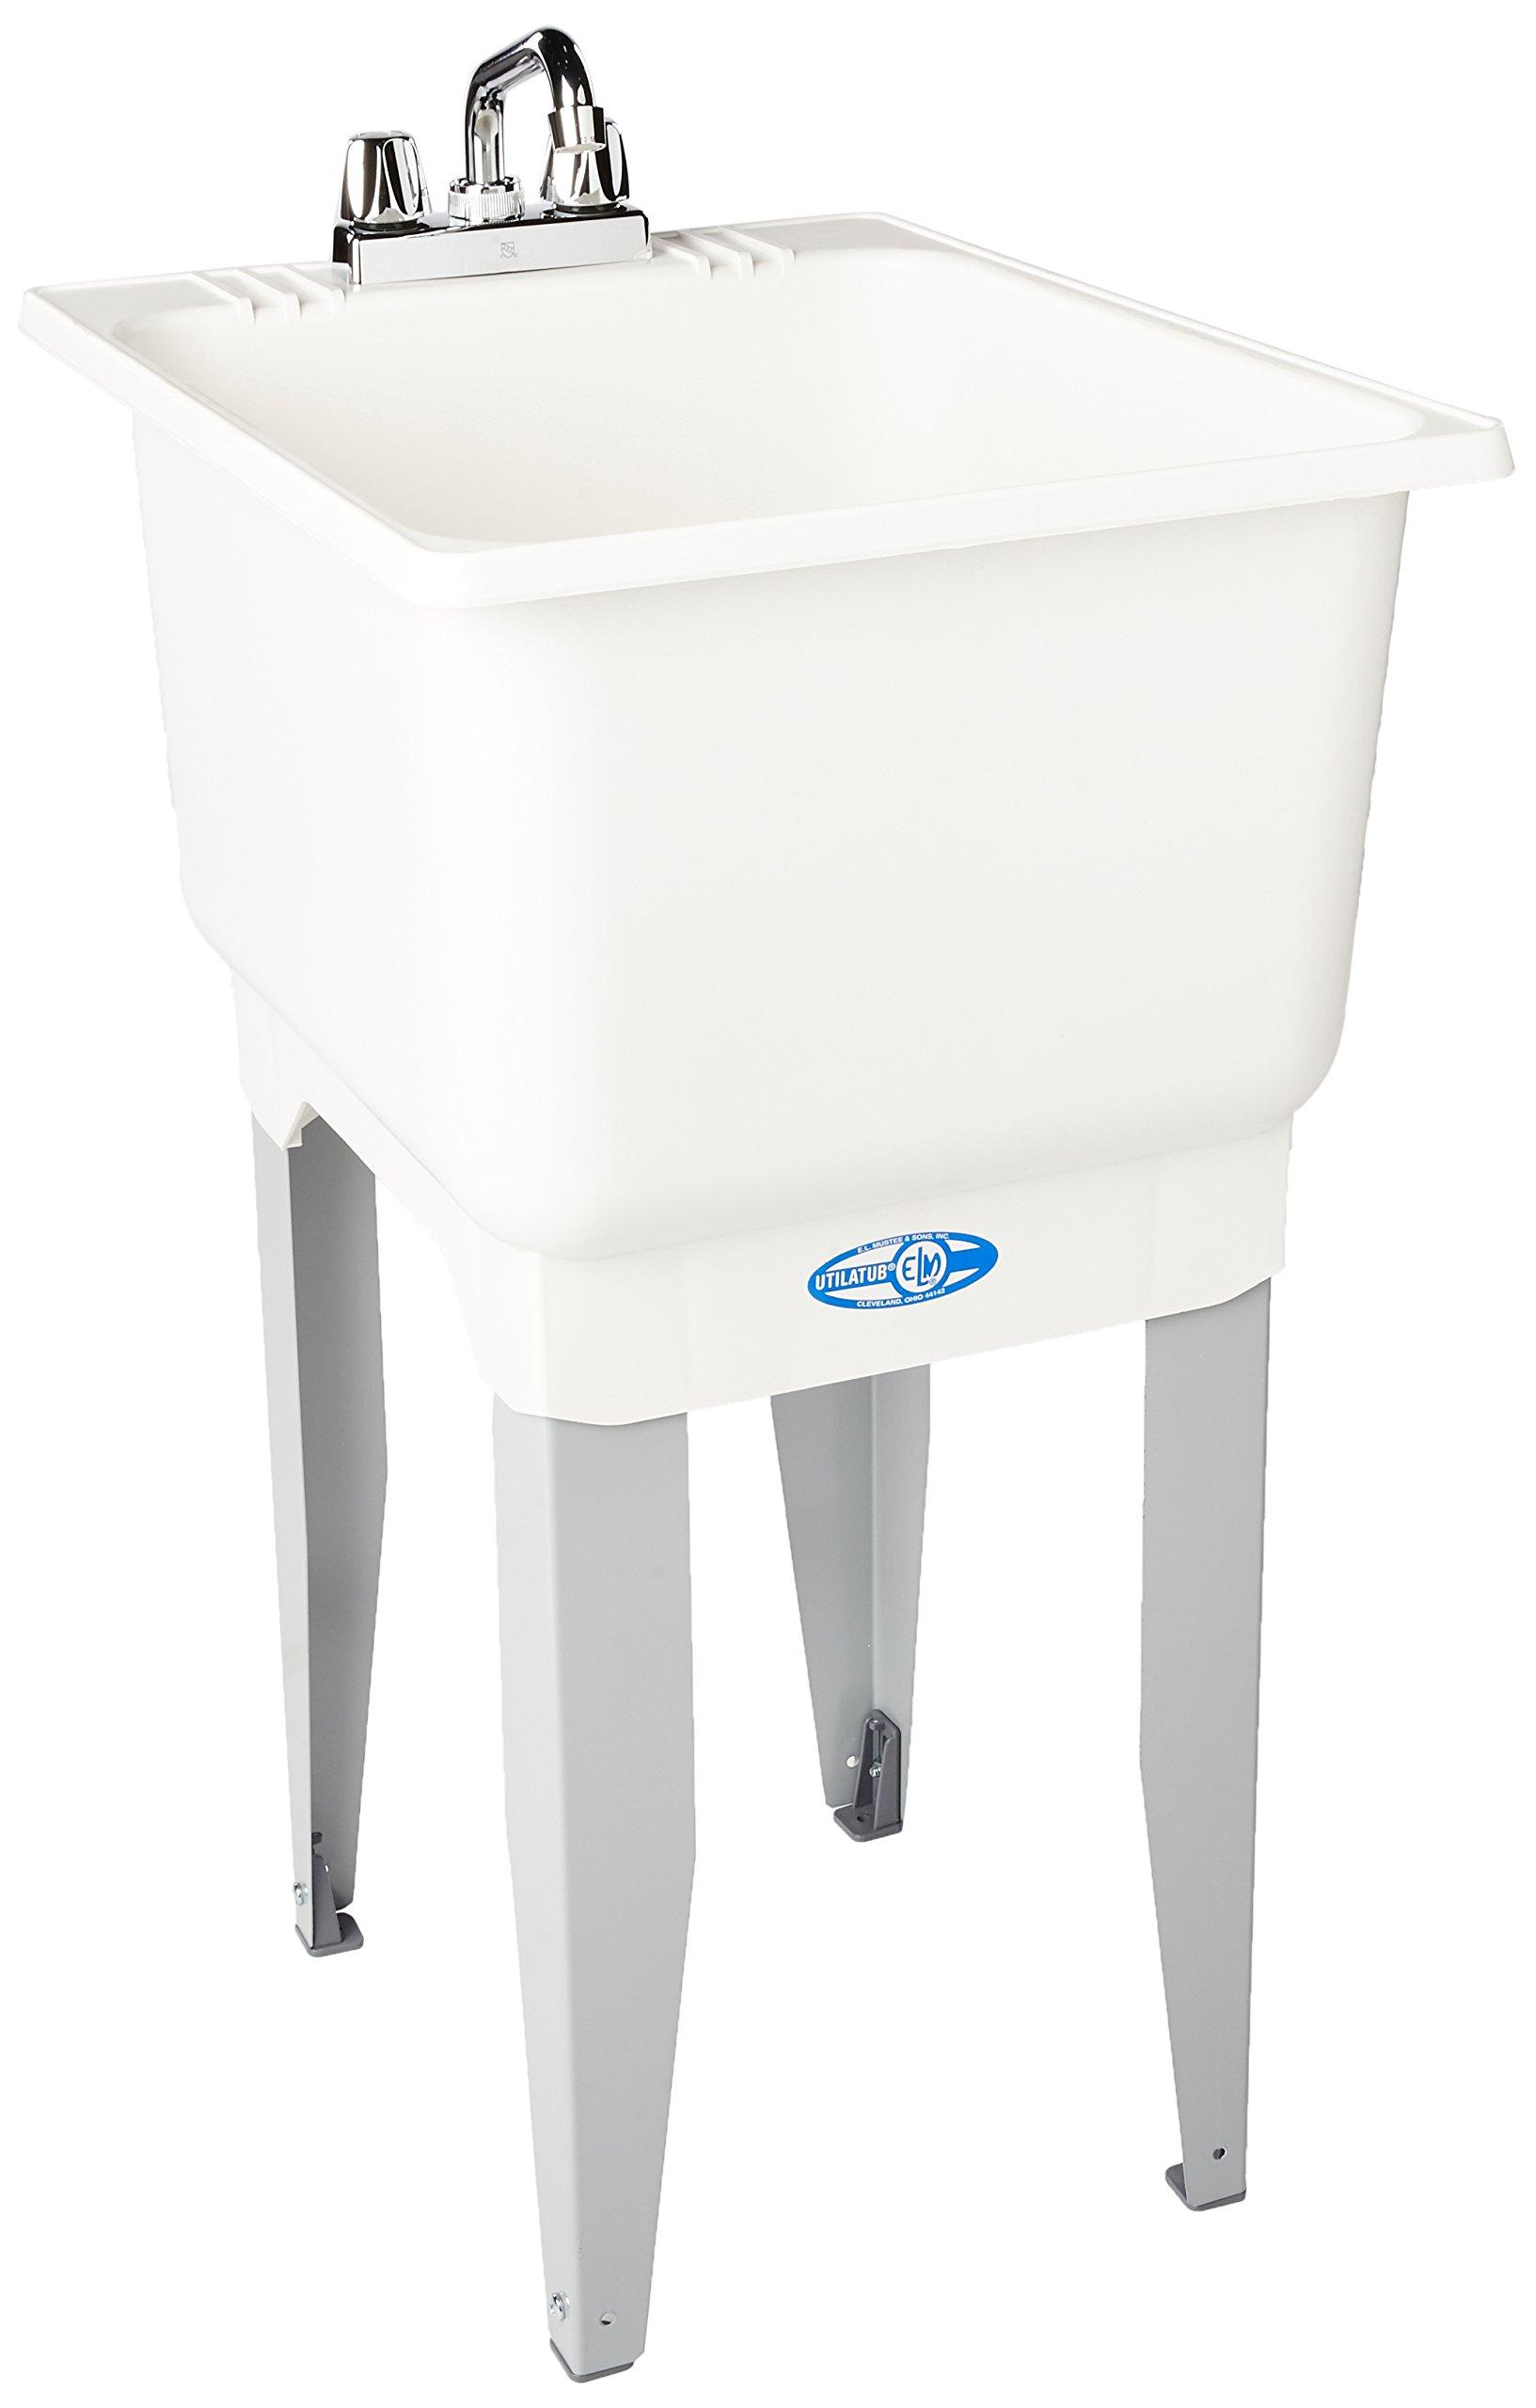 El Mustee 12C Utilatub 15-Gallon Floor-Mount Combo Laundry/Utility Tub, 33 X 18 X 23-1/2 In, White